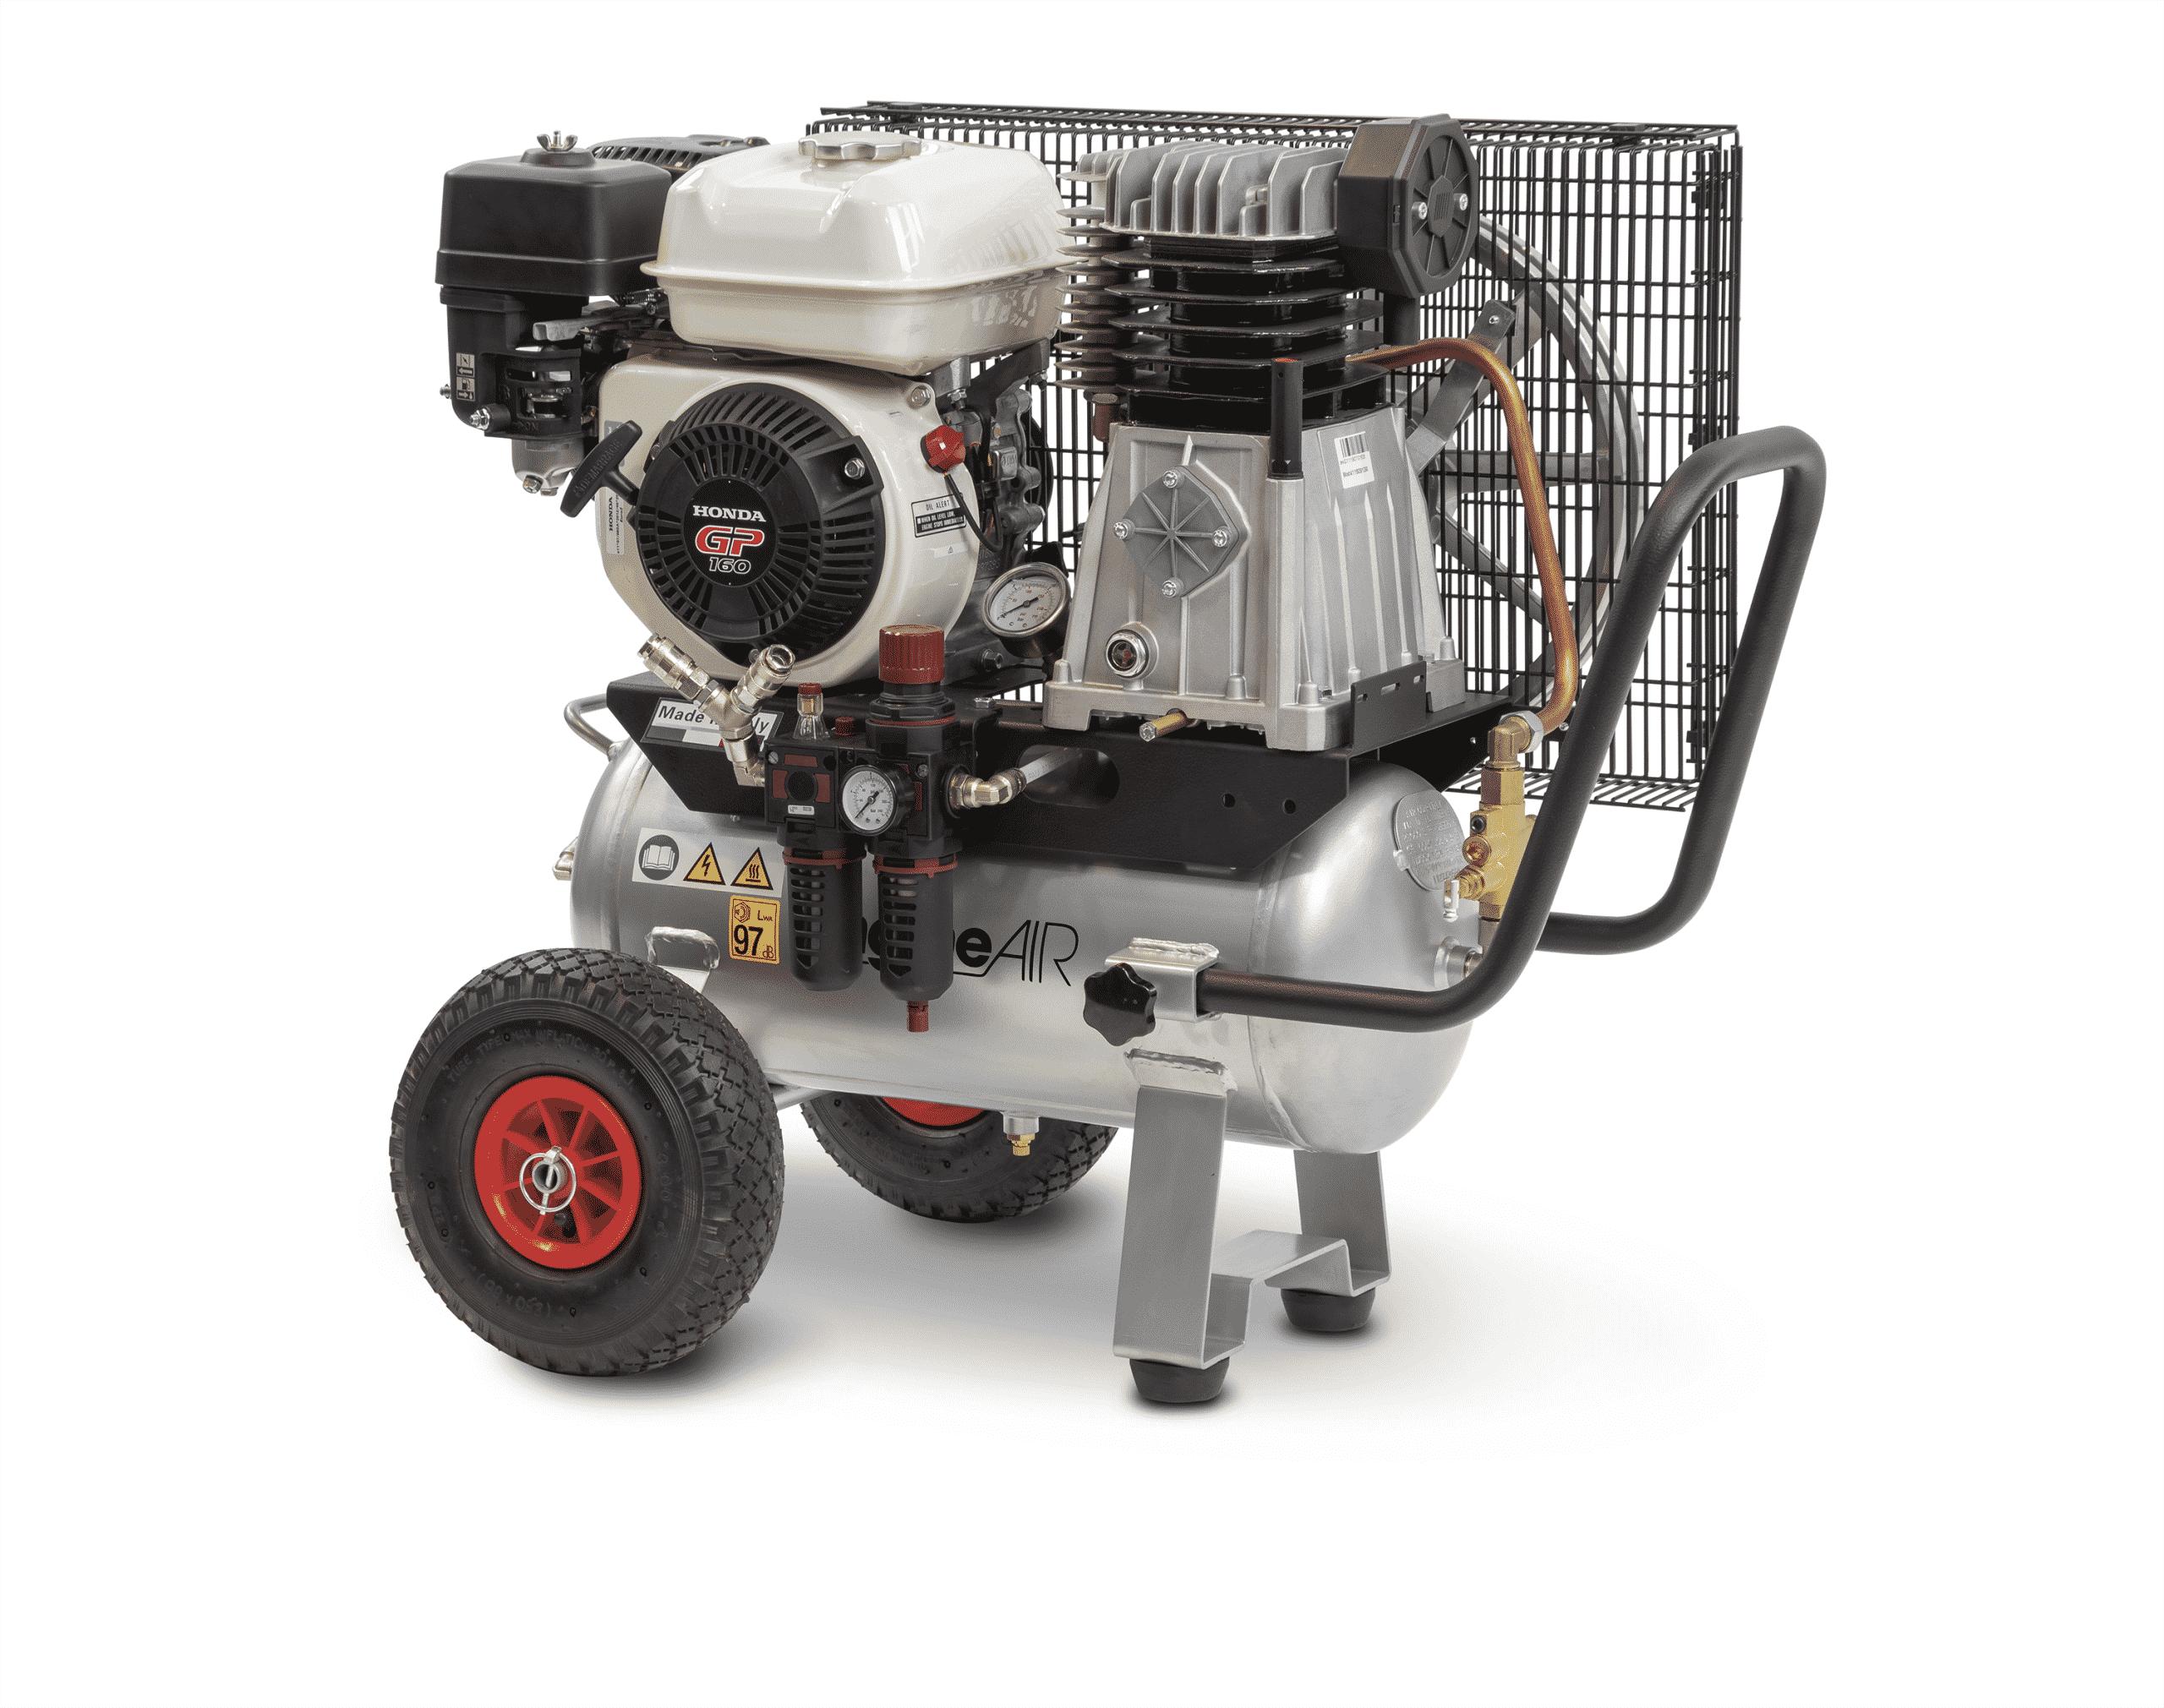 engineAIR 5/24 10 Benzin